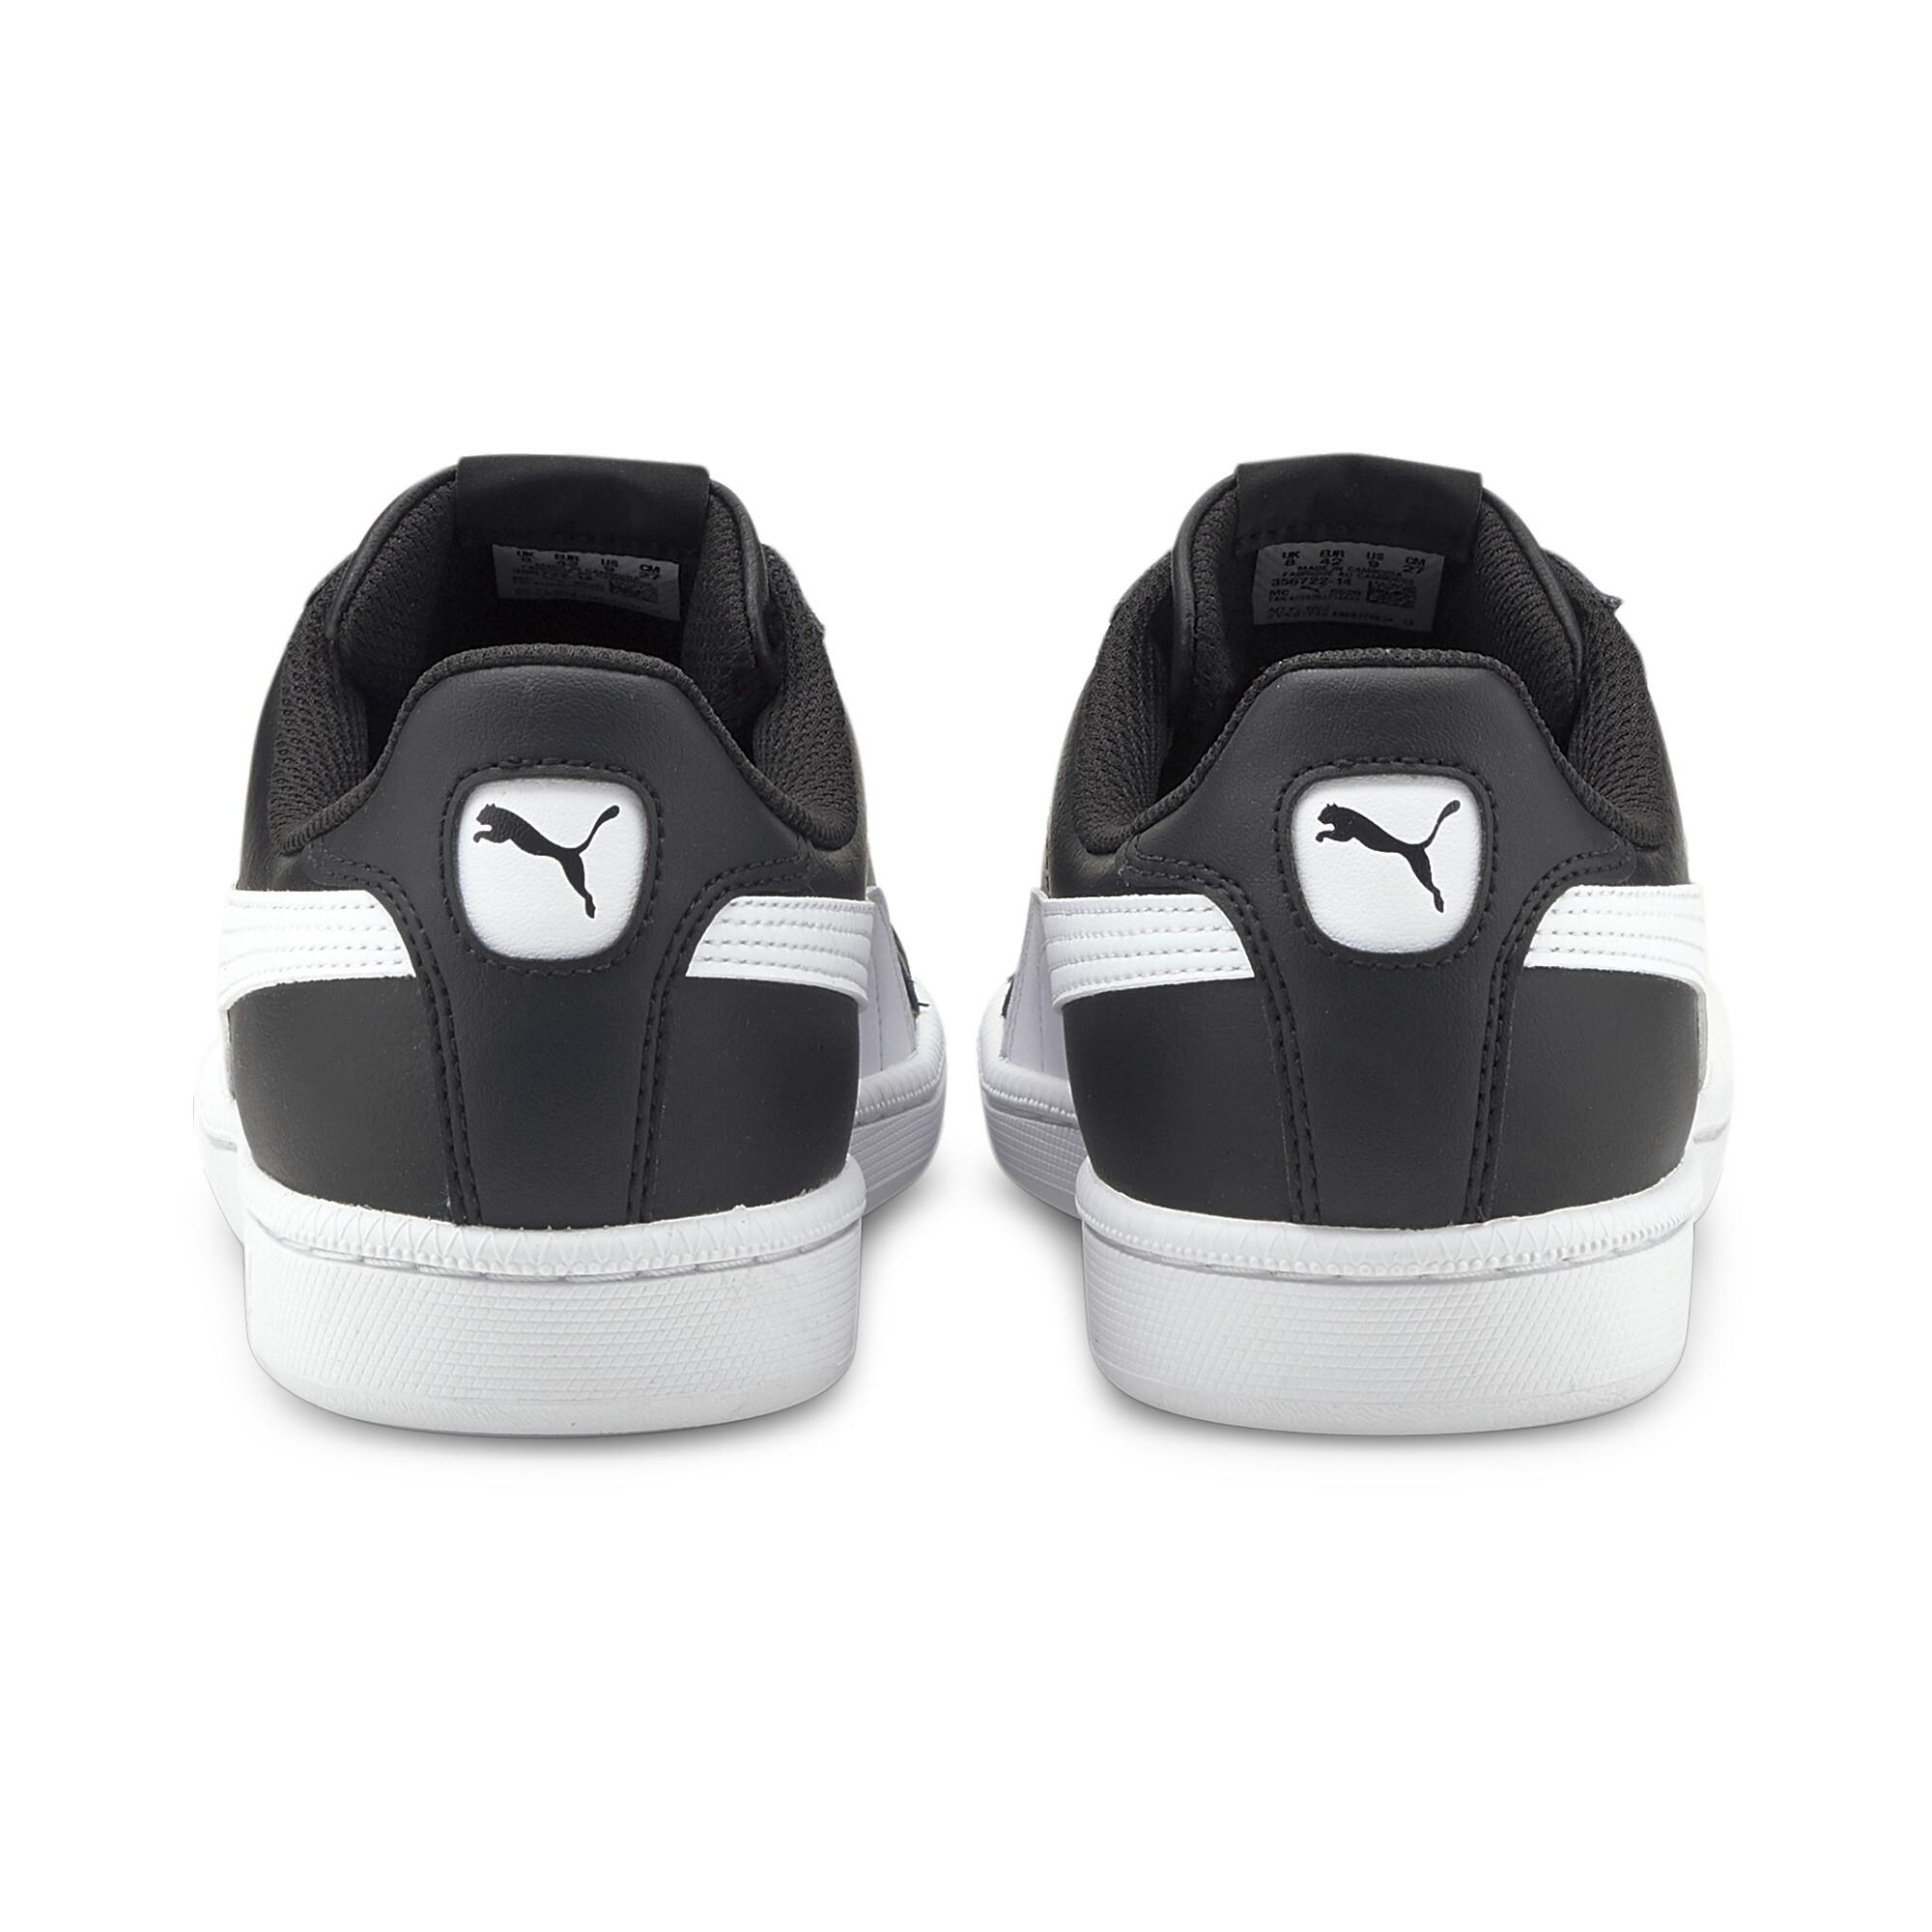 PUMA-Smash-Trainers-Schuhe-Sneakers-Sport-Classics-Unisex-Neu Indexbild 18